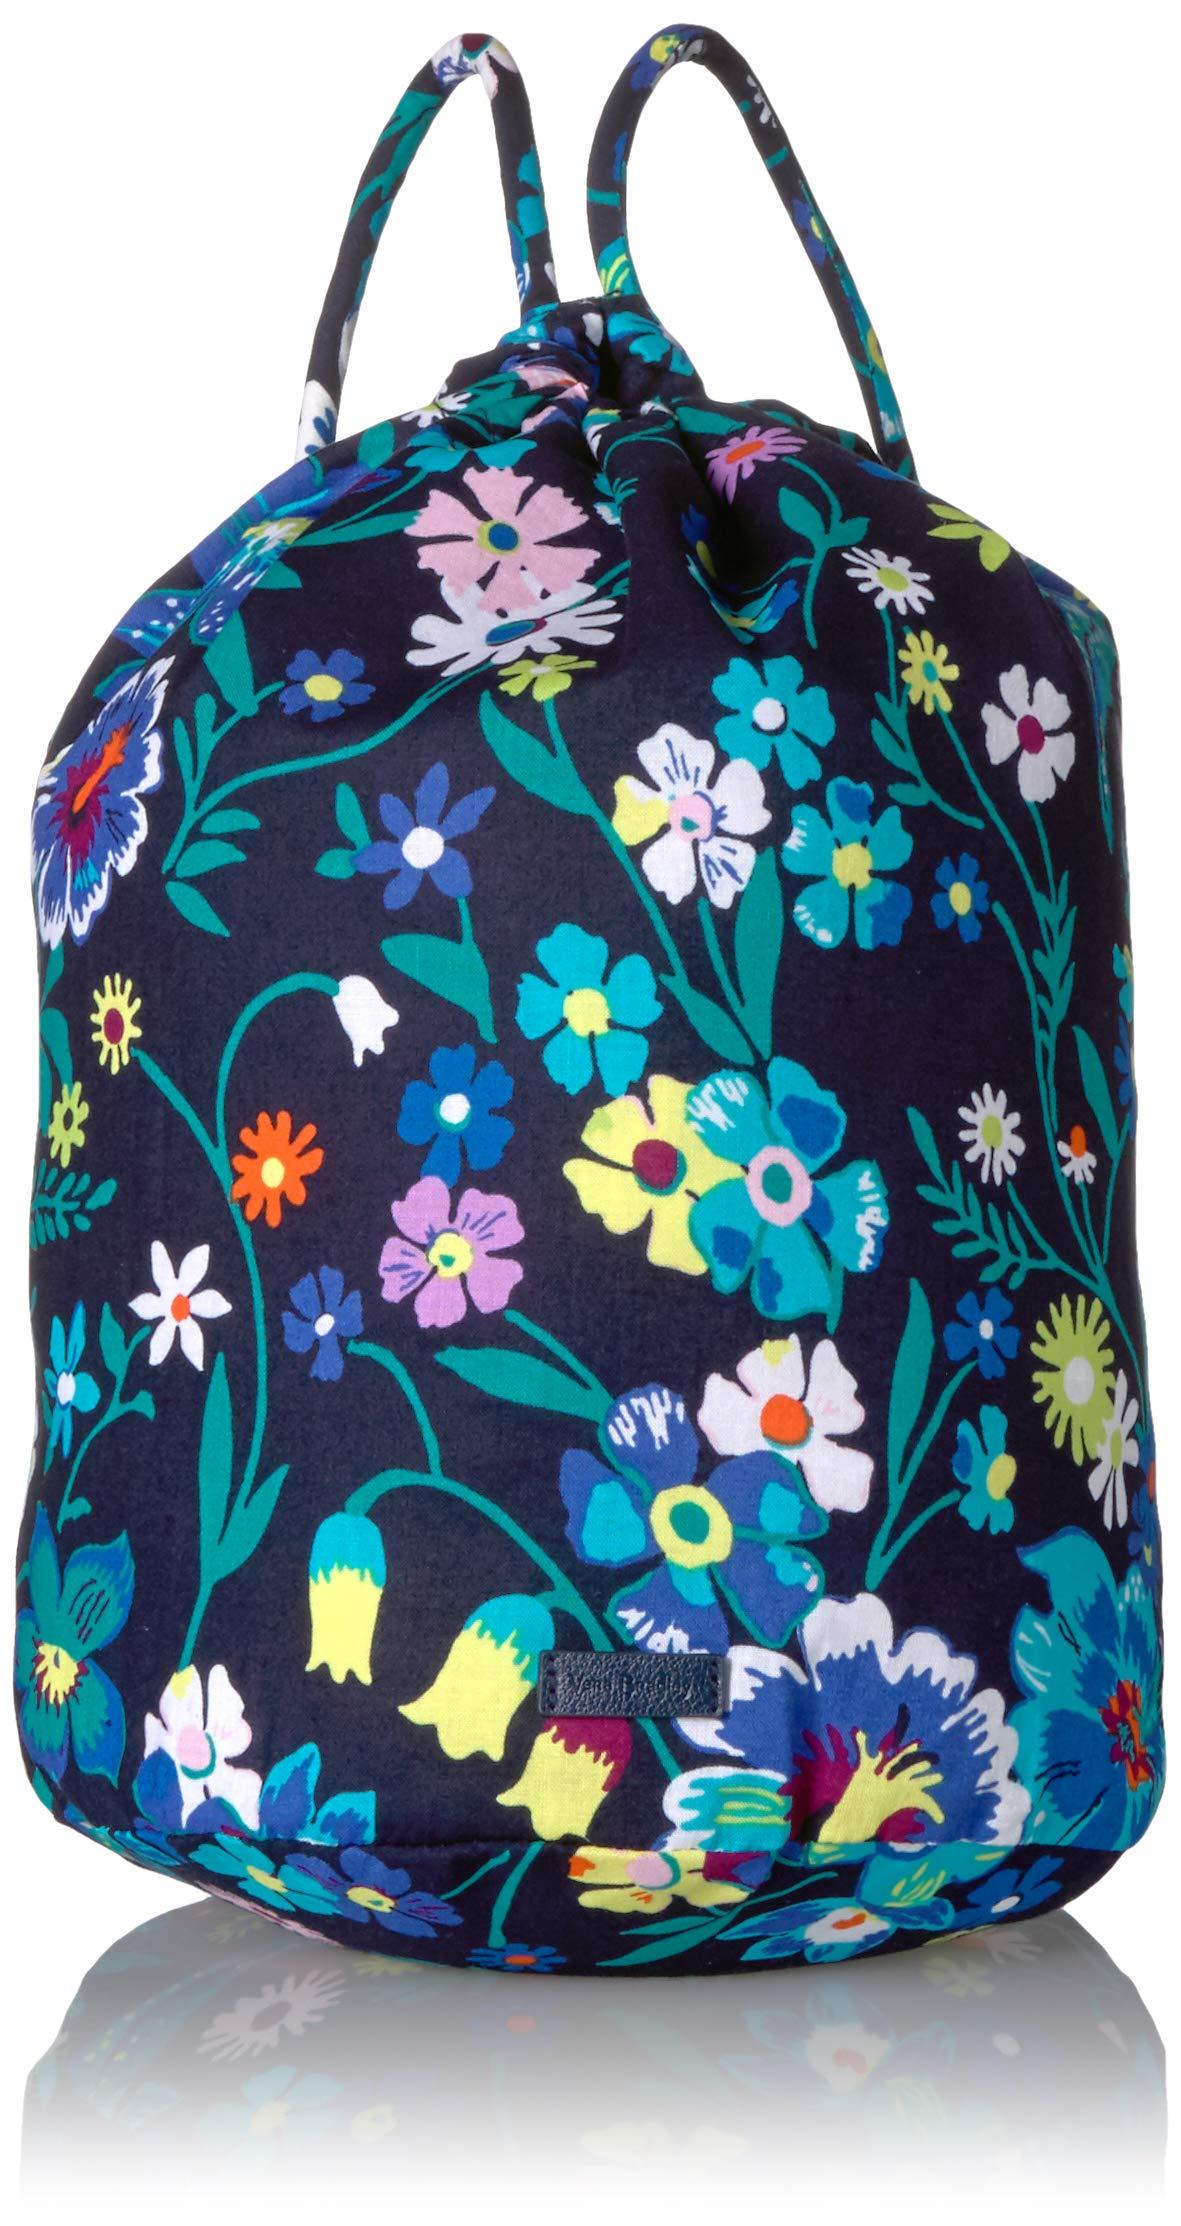 Vera Bradley Iconic Ditty Bag, Signature Cotton, Moonlight Garde